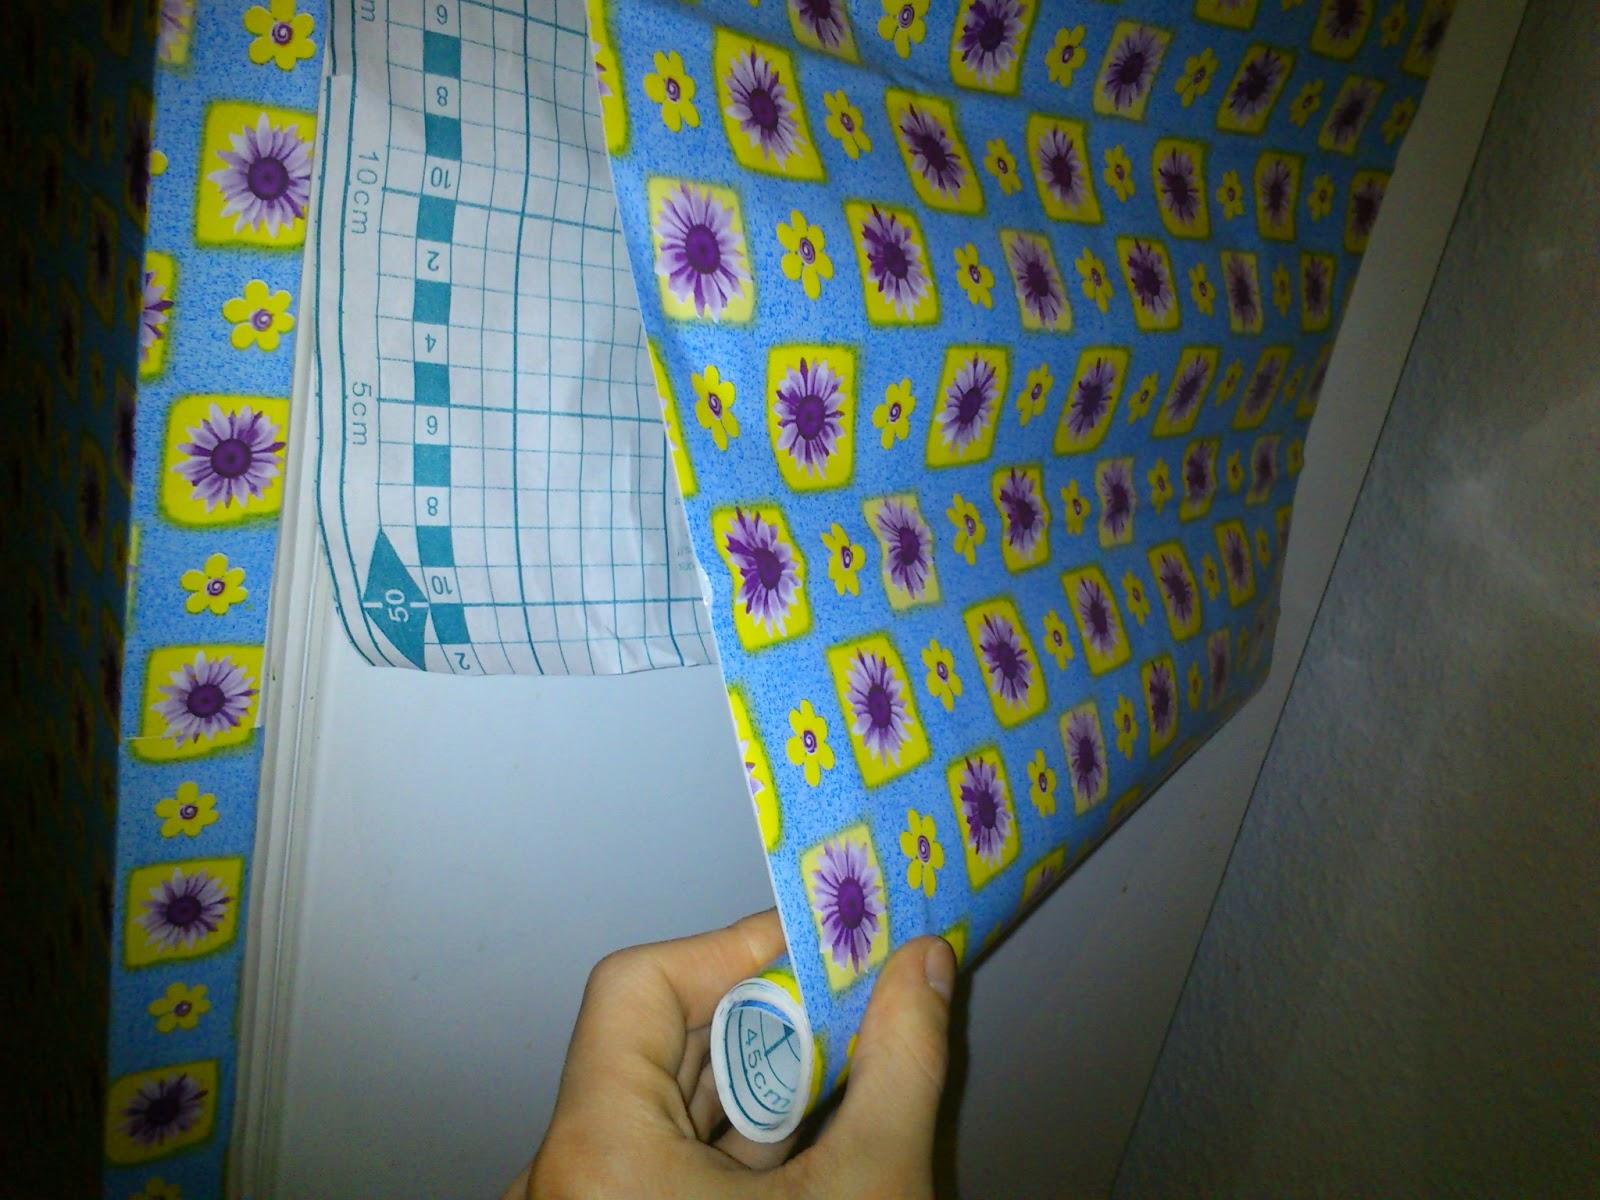 Retro Kühlschrank Folie : Aerosolwerk kühlschrank folieren rostiges blech